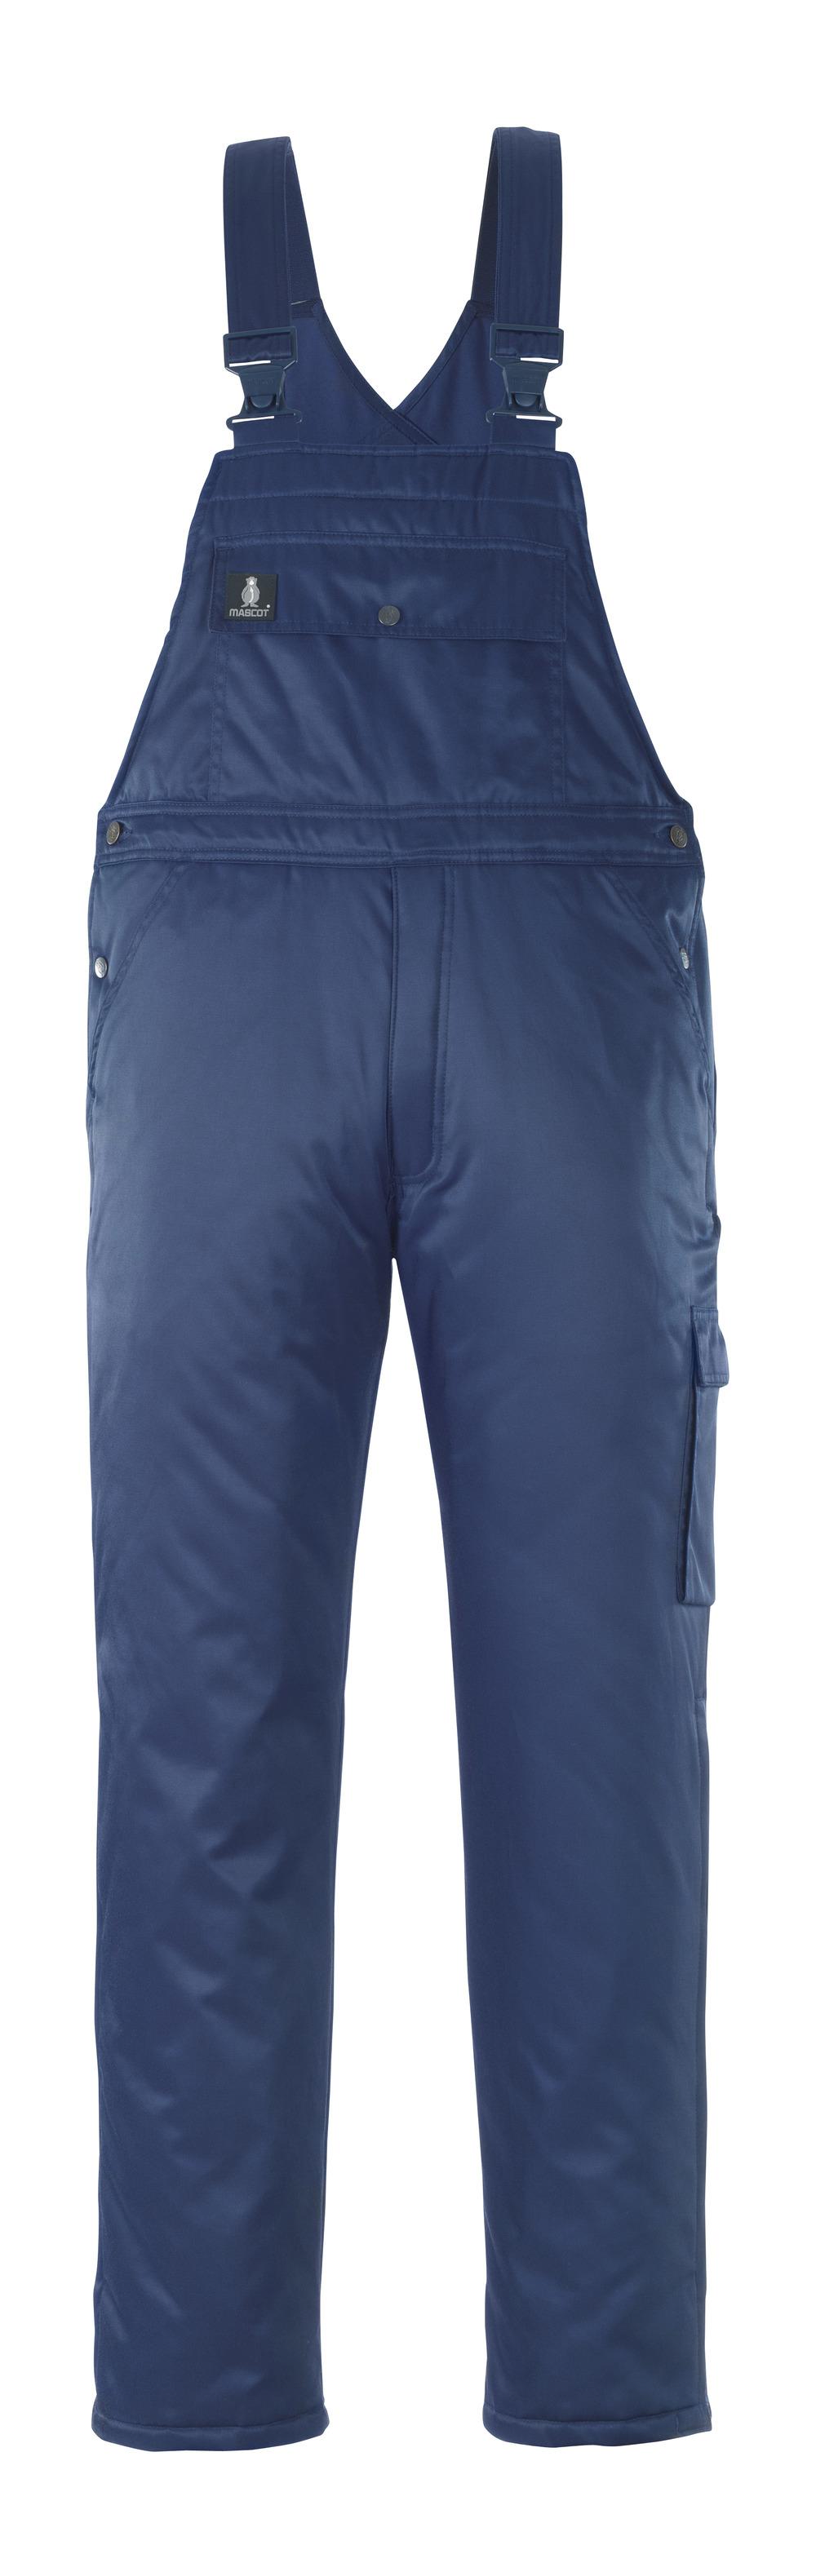 00512-620-01 Peto de invierno - azul marino